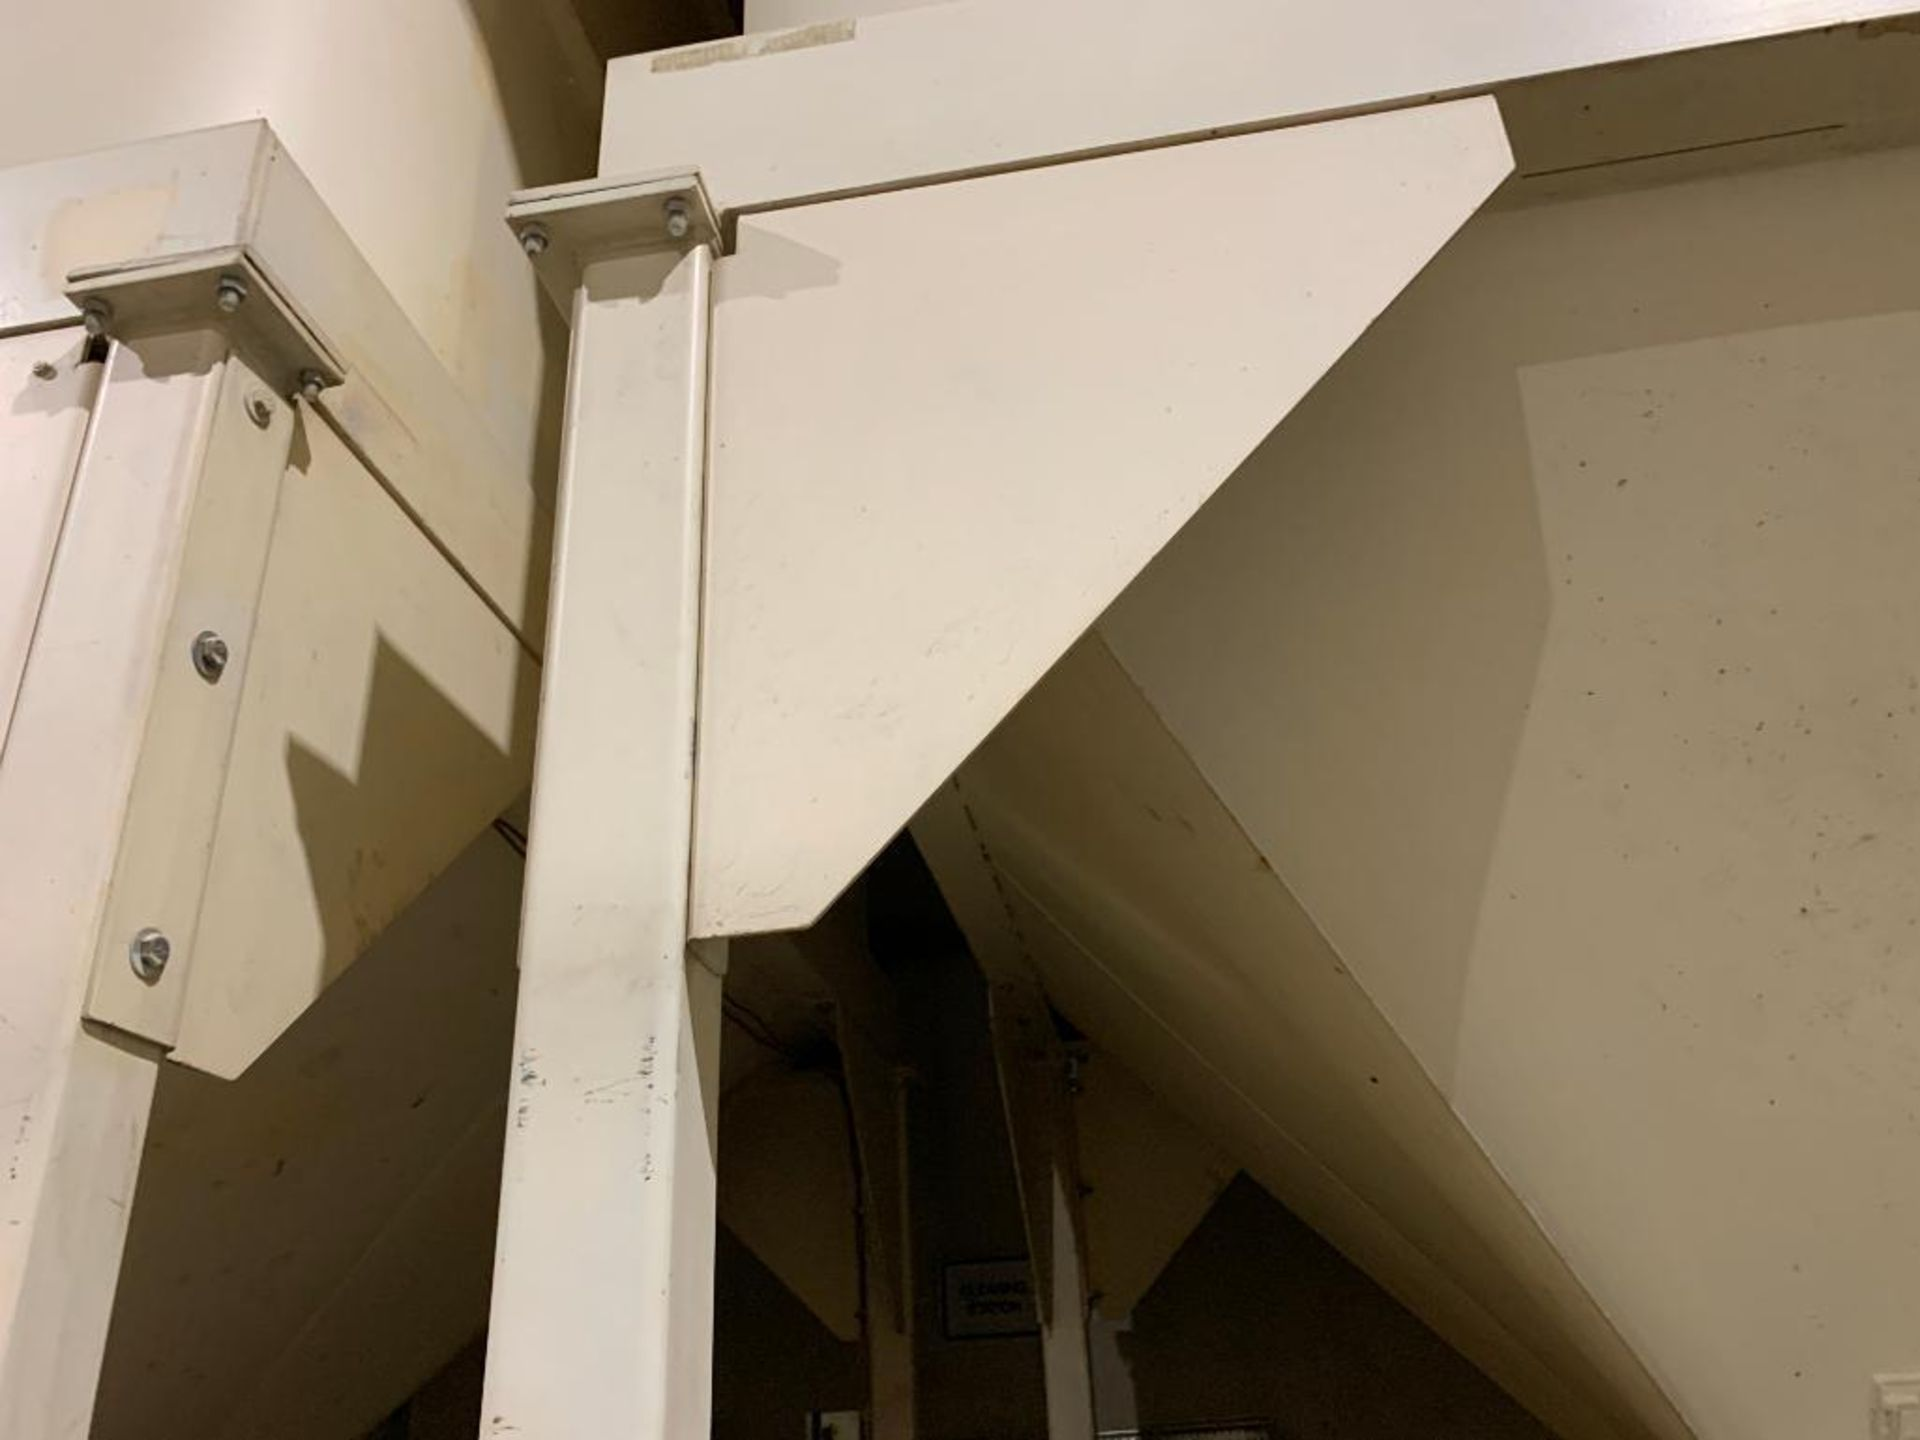 Aseeco mild steel cone bottom bulk storage bin - Image 8 of 25